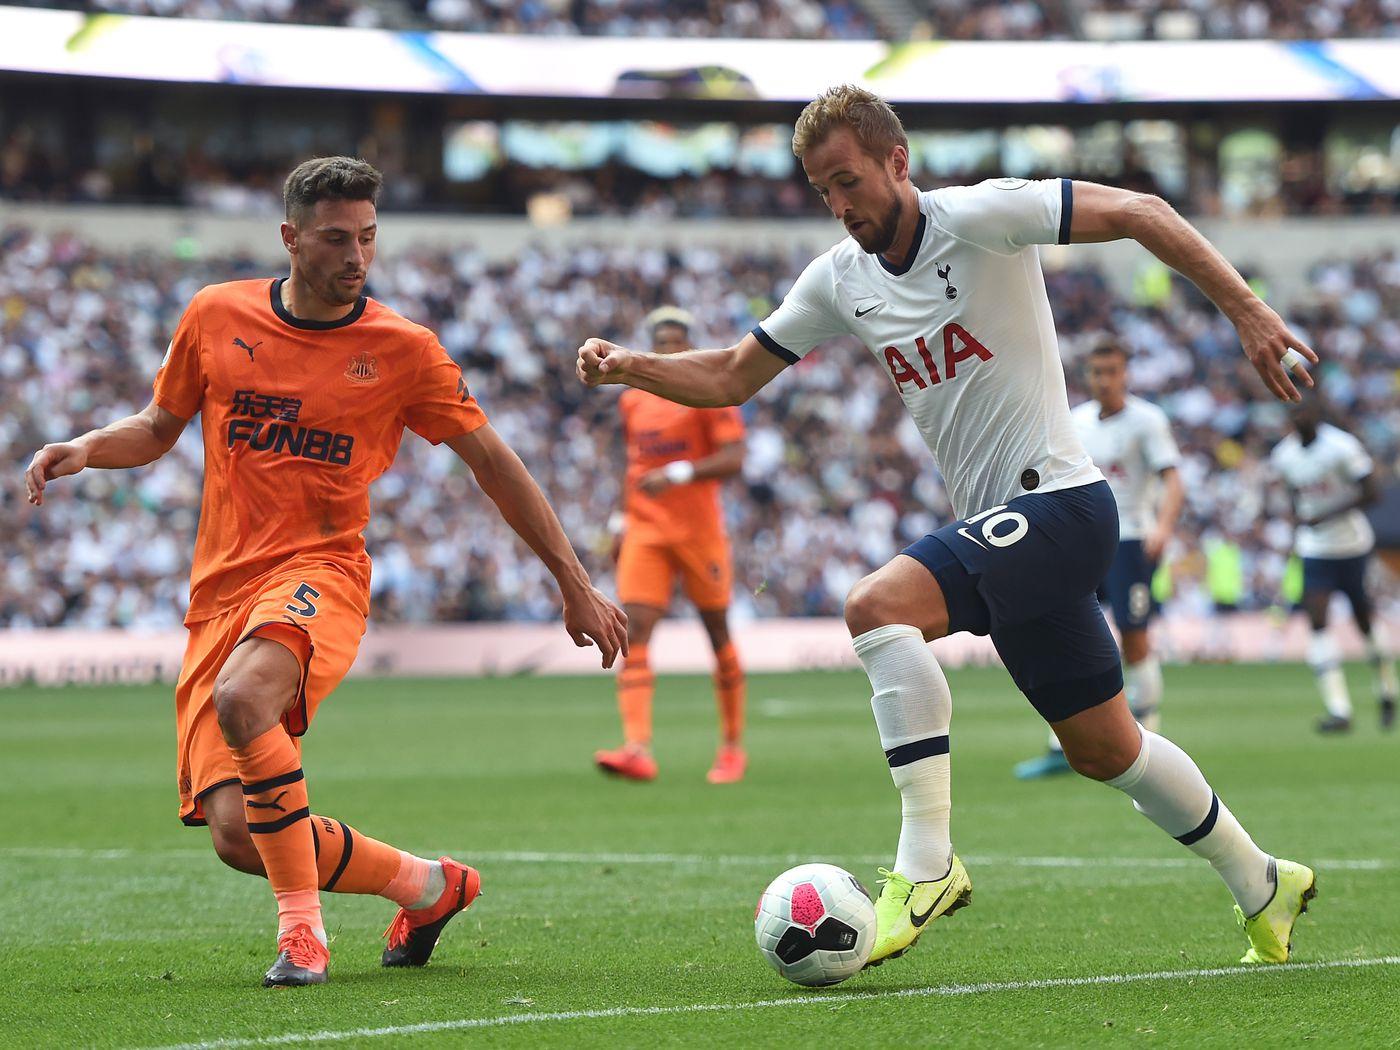 Tottenham Hotspur Vs Newcastle United 2020 Premier League Game Time Tv Channels How To Watch Cartilage Free Captain